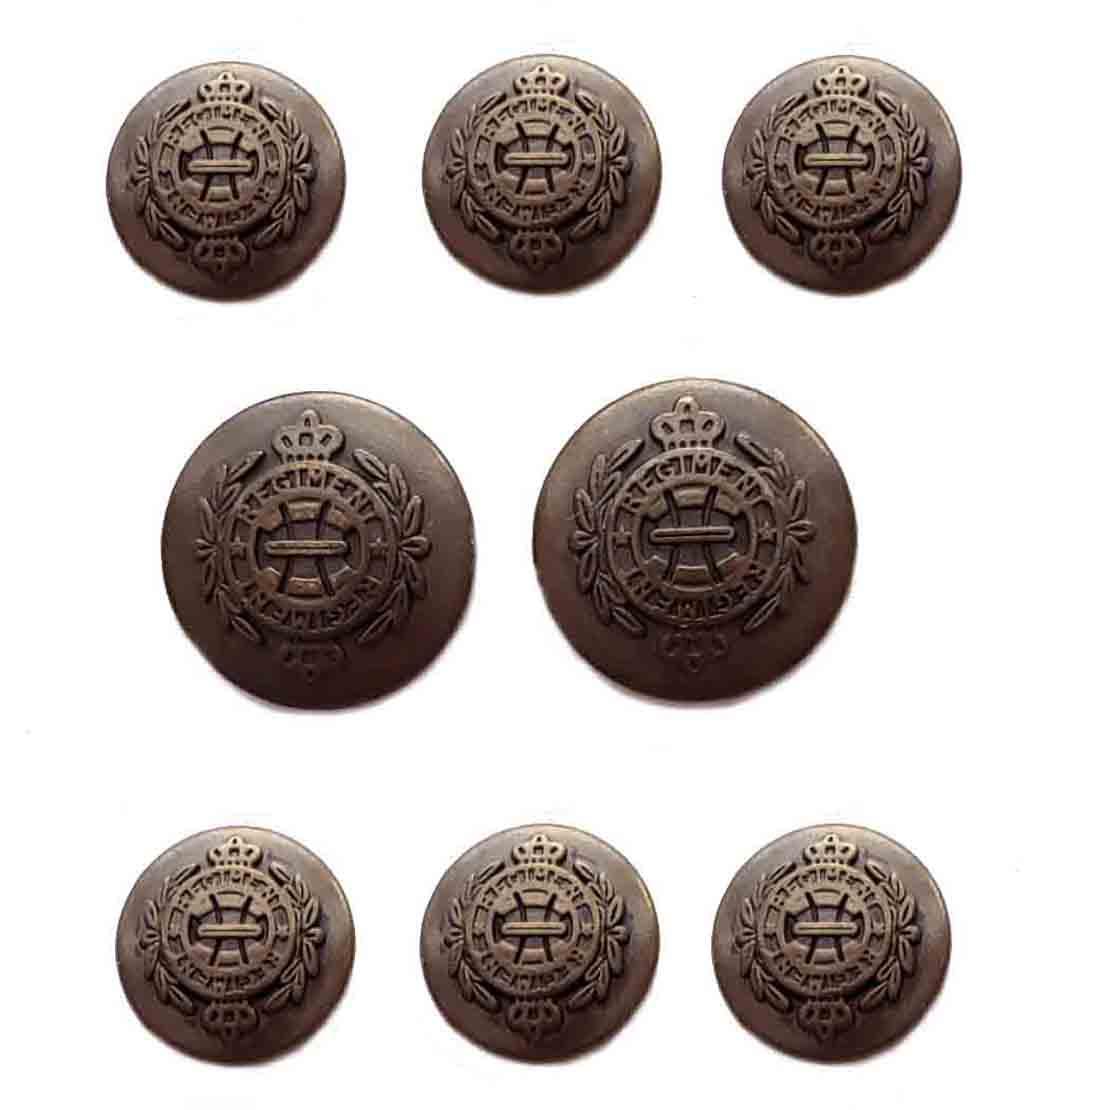 Vintage Meeting Street Regiment Blazer Buttons Set Bronze Metal Shank Men's